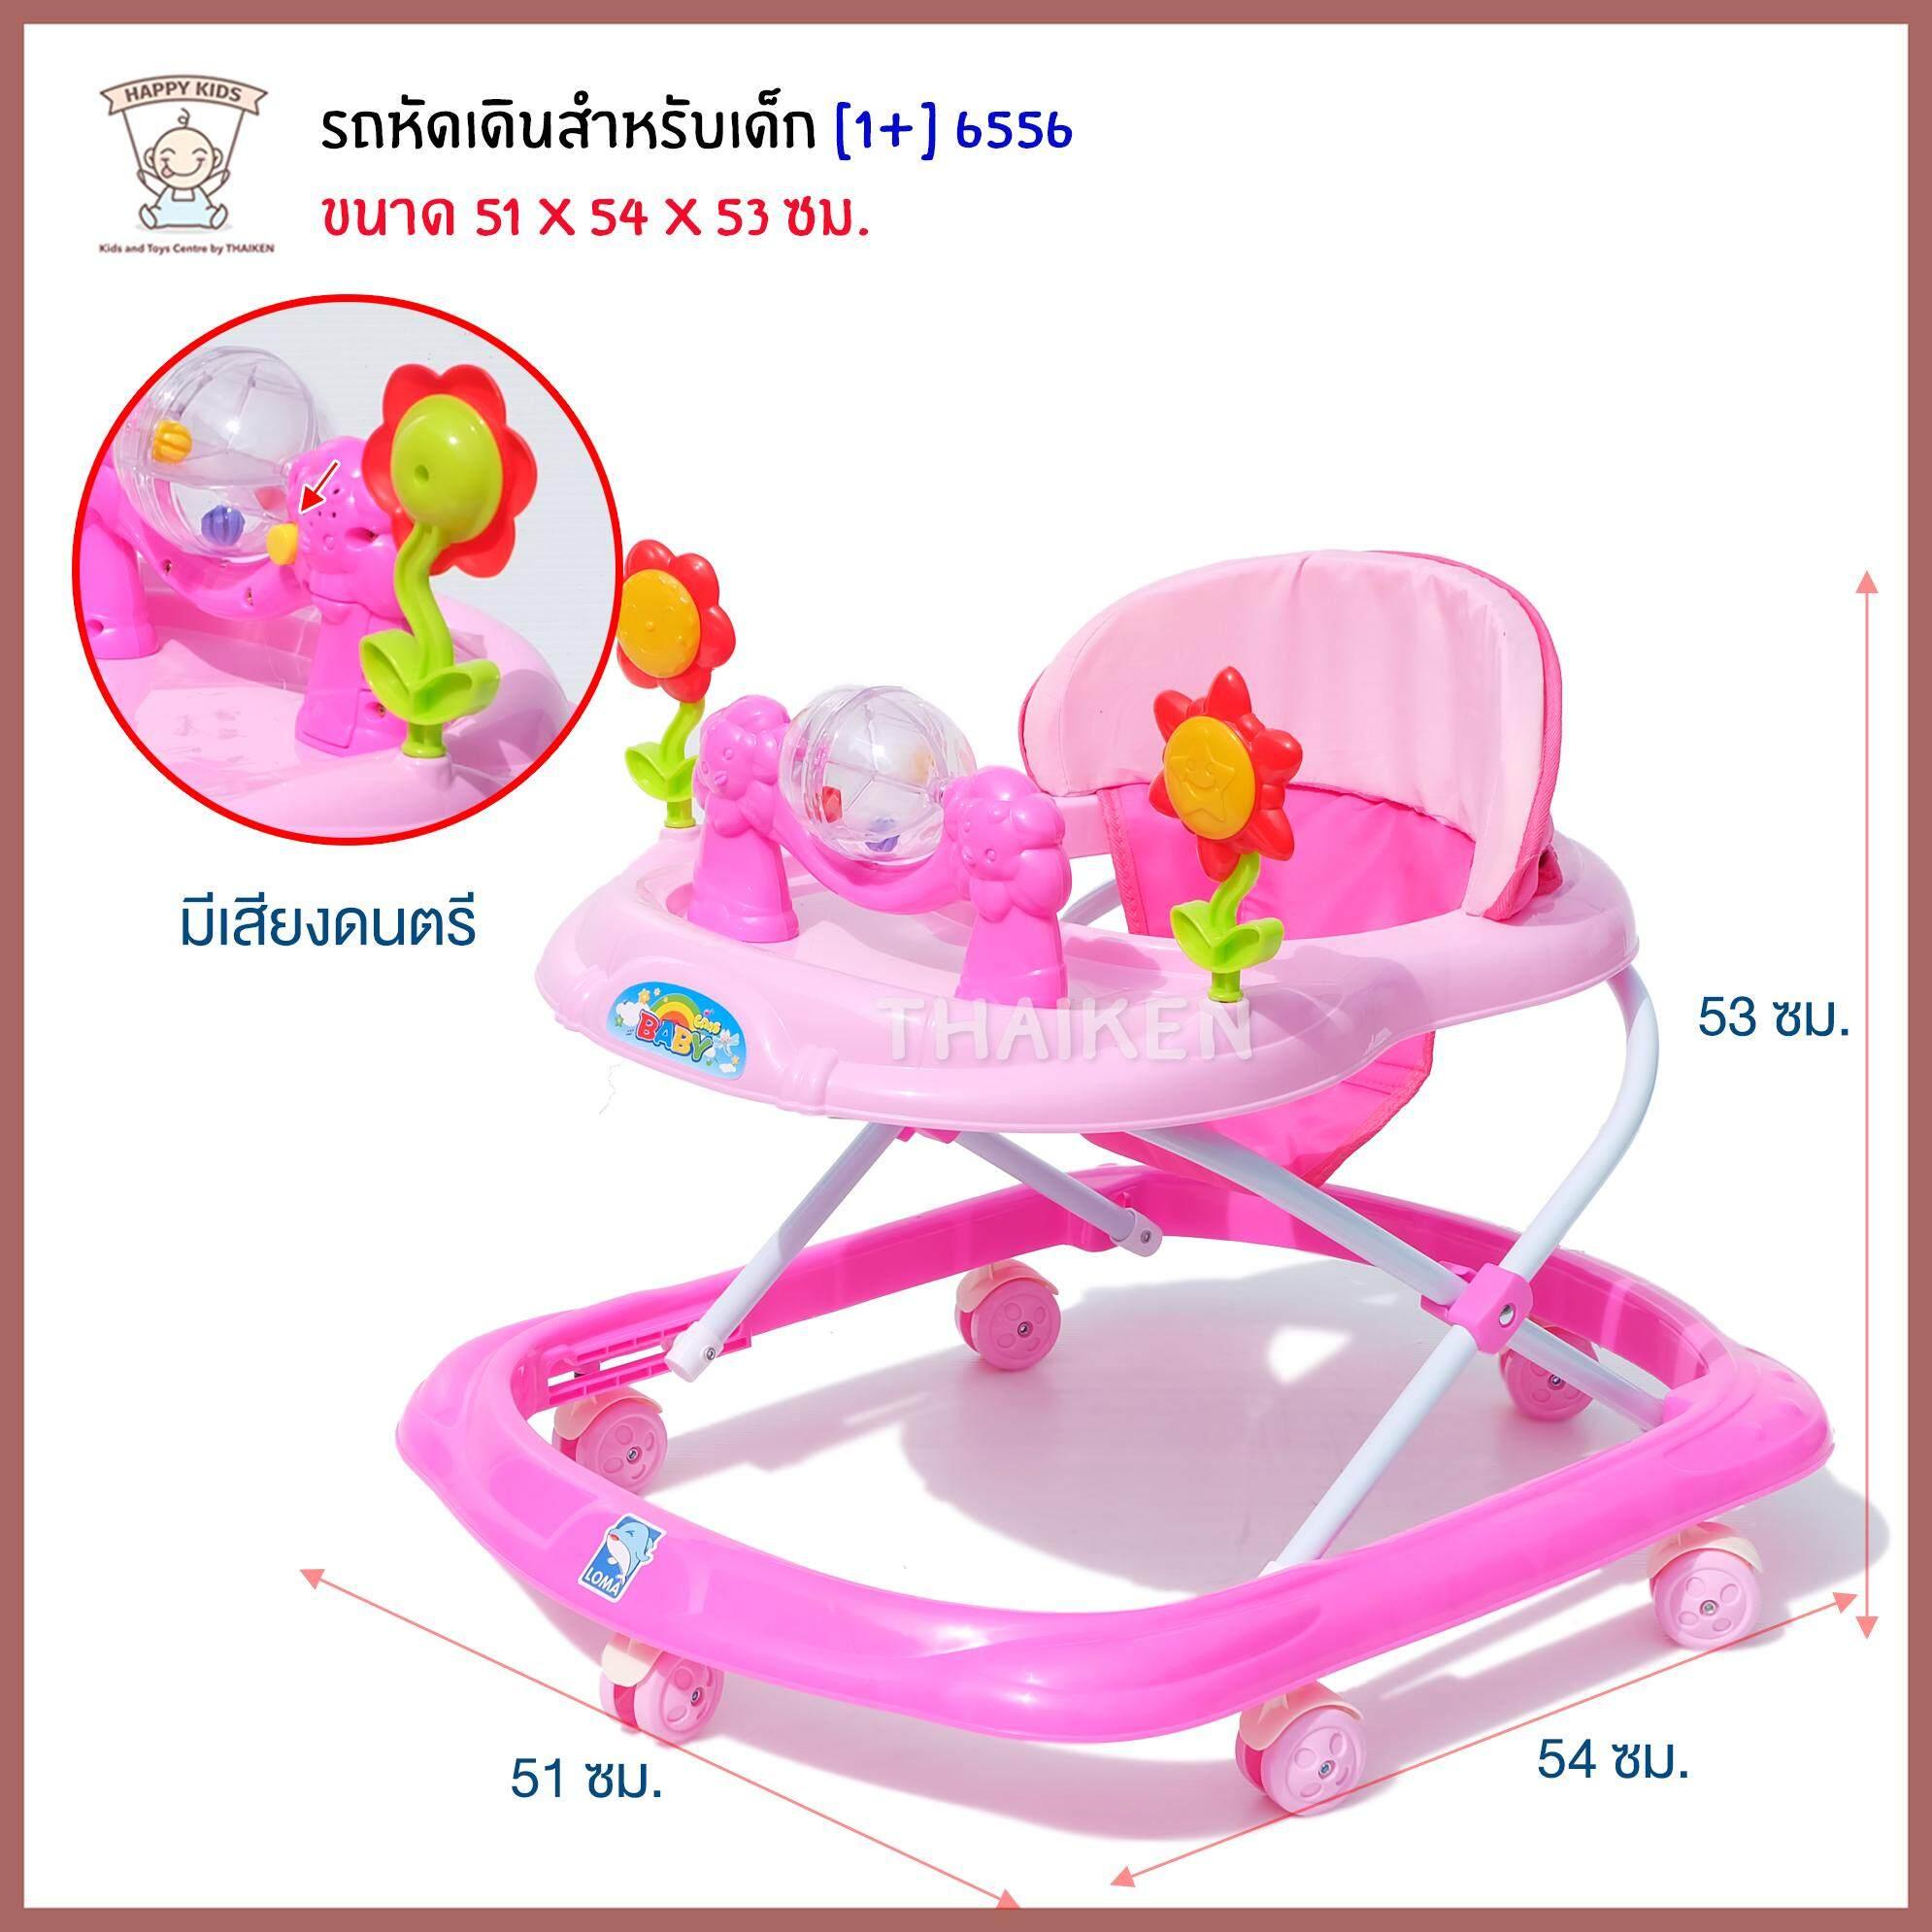 Thaiken รถหัดเดิน ถาด ของเล่น Baby Walker series 6556